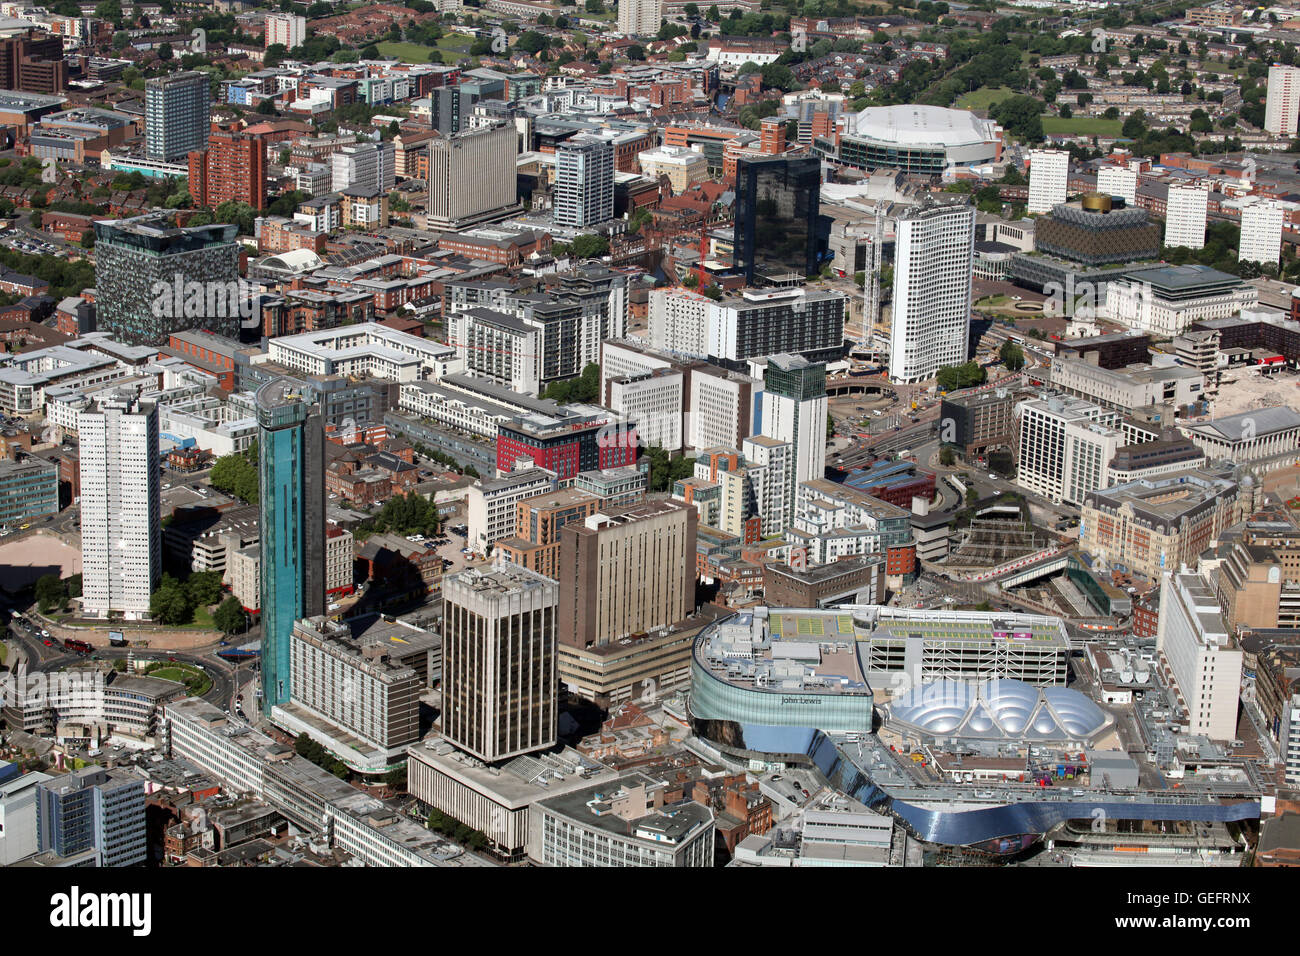 aerial view of Birmingham city centre, UK - Stock Image